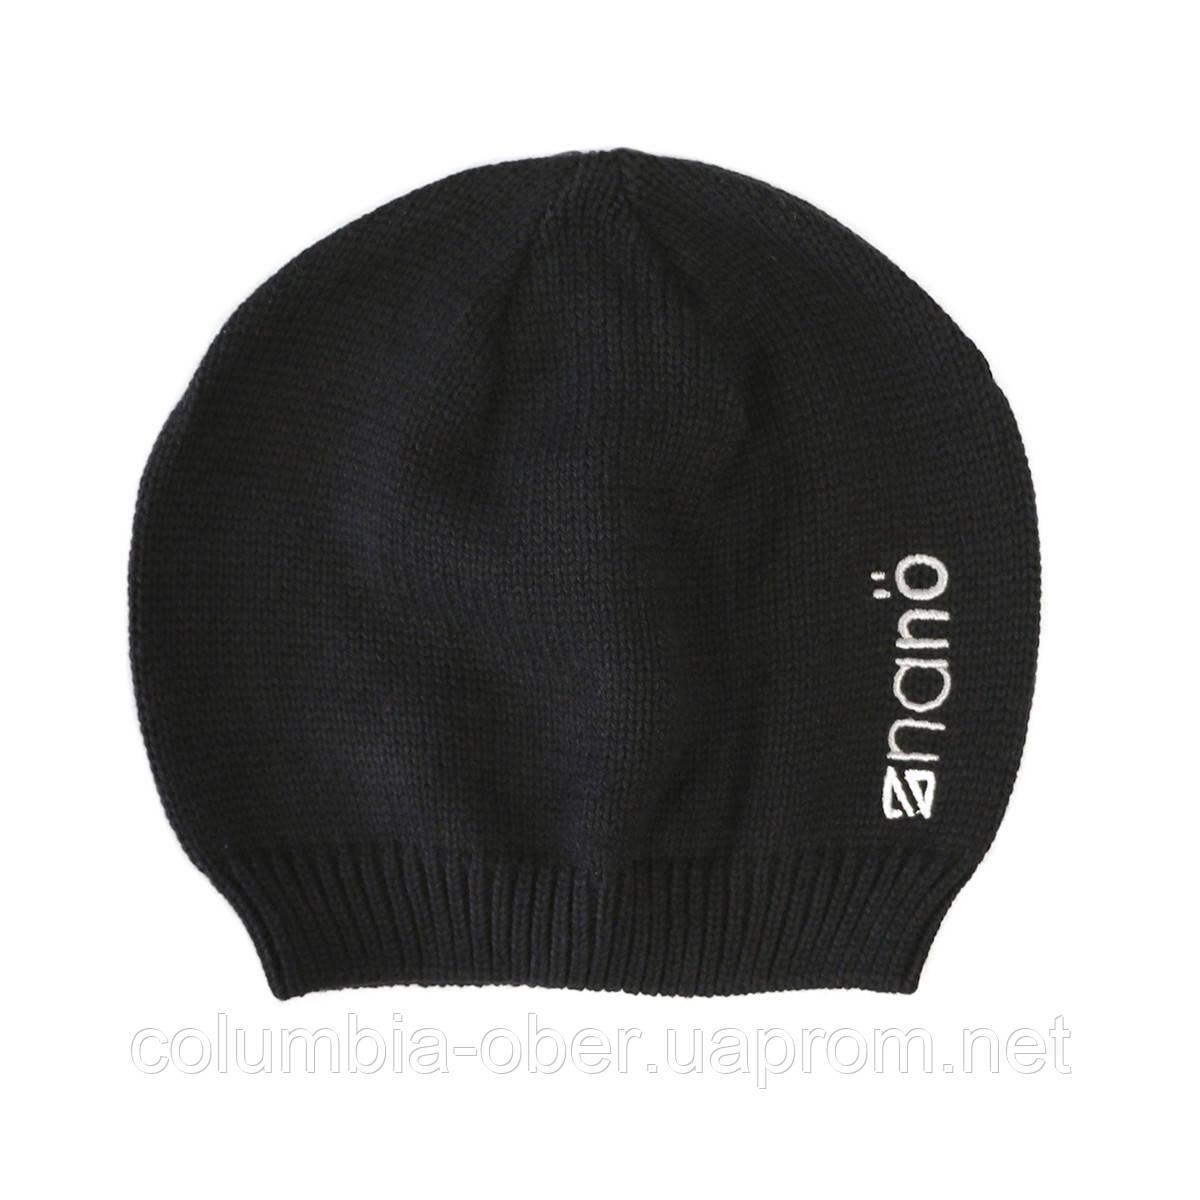 Демисезонная шапка  для мальчика  NANO 200 BTUT S17 Black. Р-р  2/4Х - 7/12.